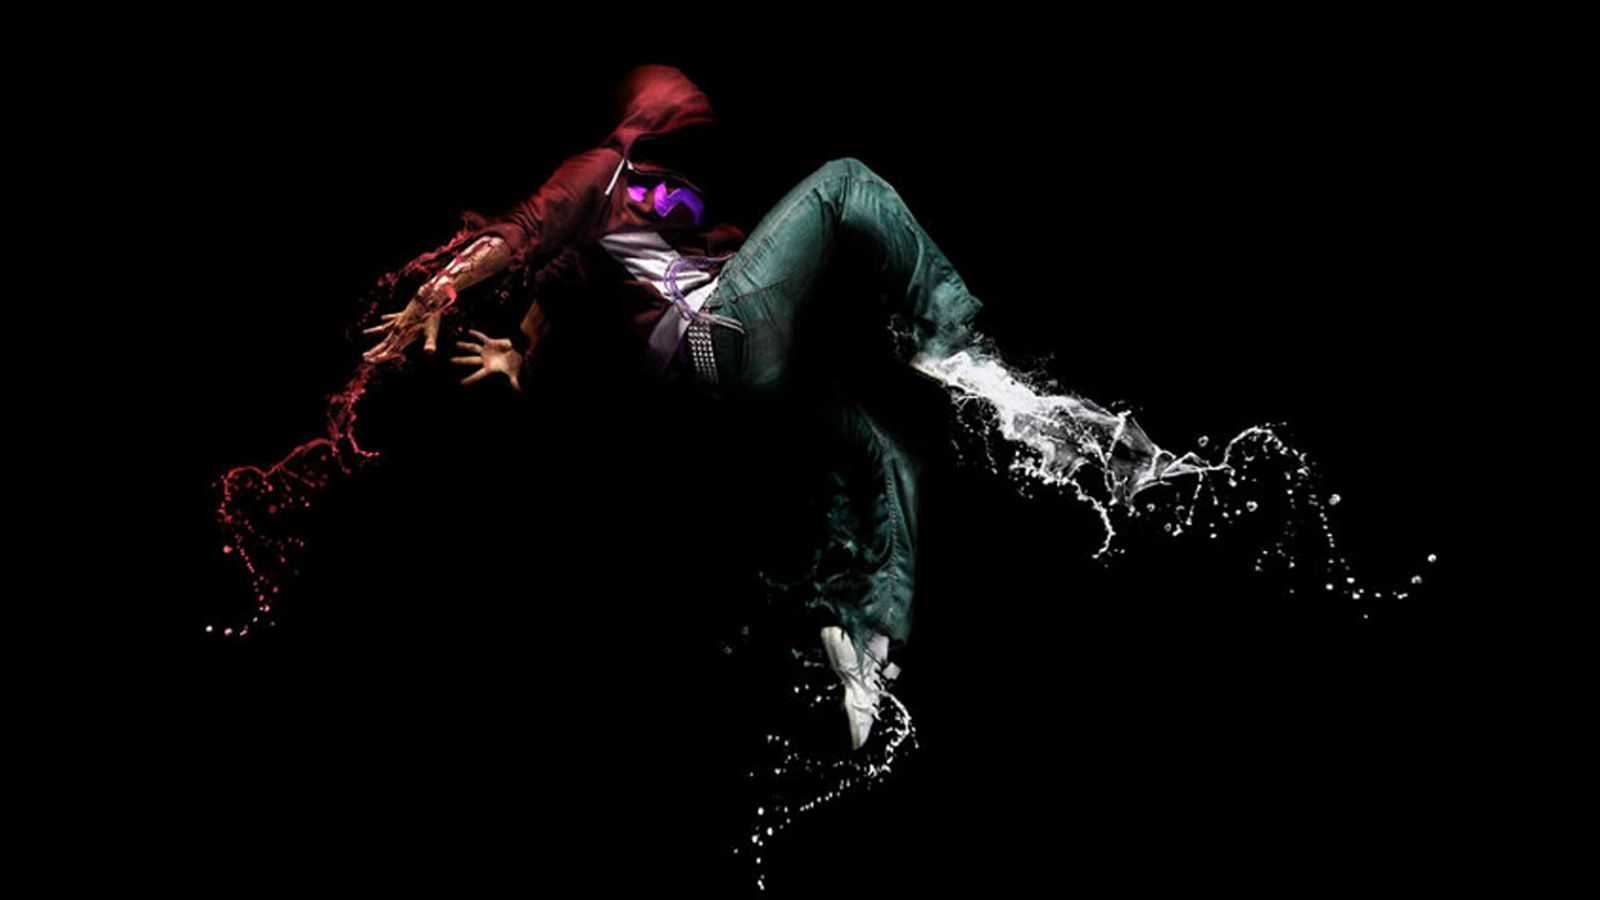 Light dance colourful light vision background 1024768 dance desktop backgrounds voltagebd Image collections